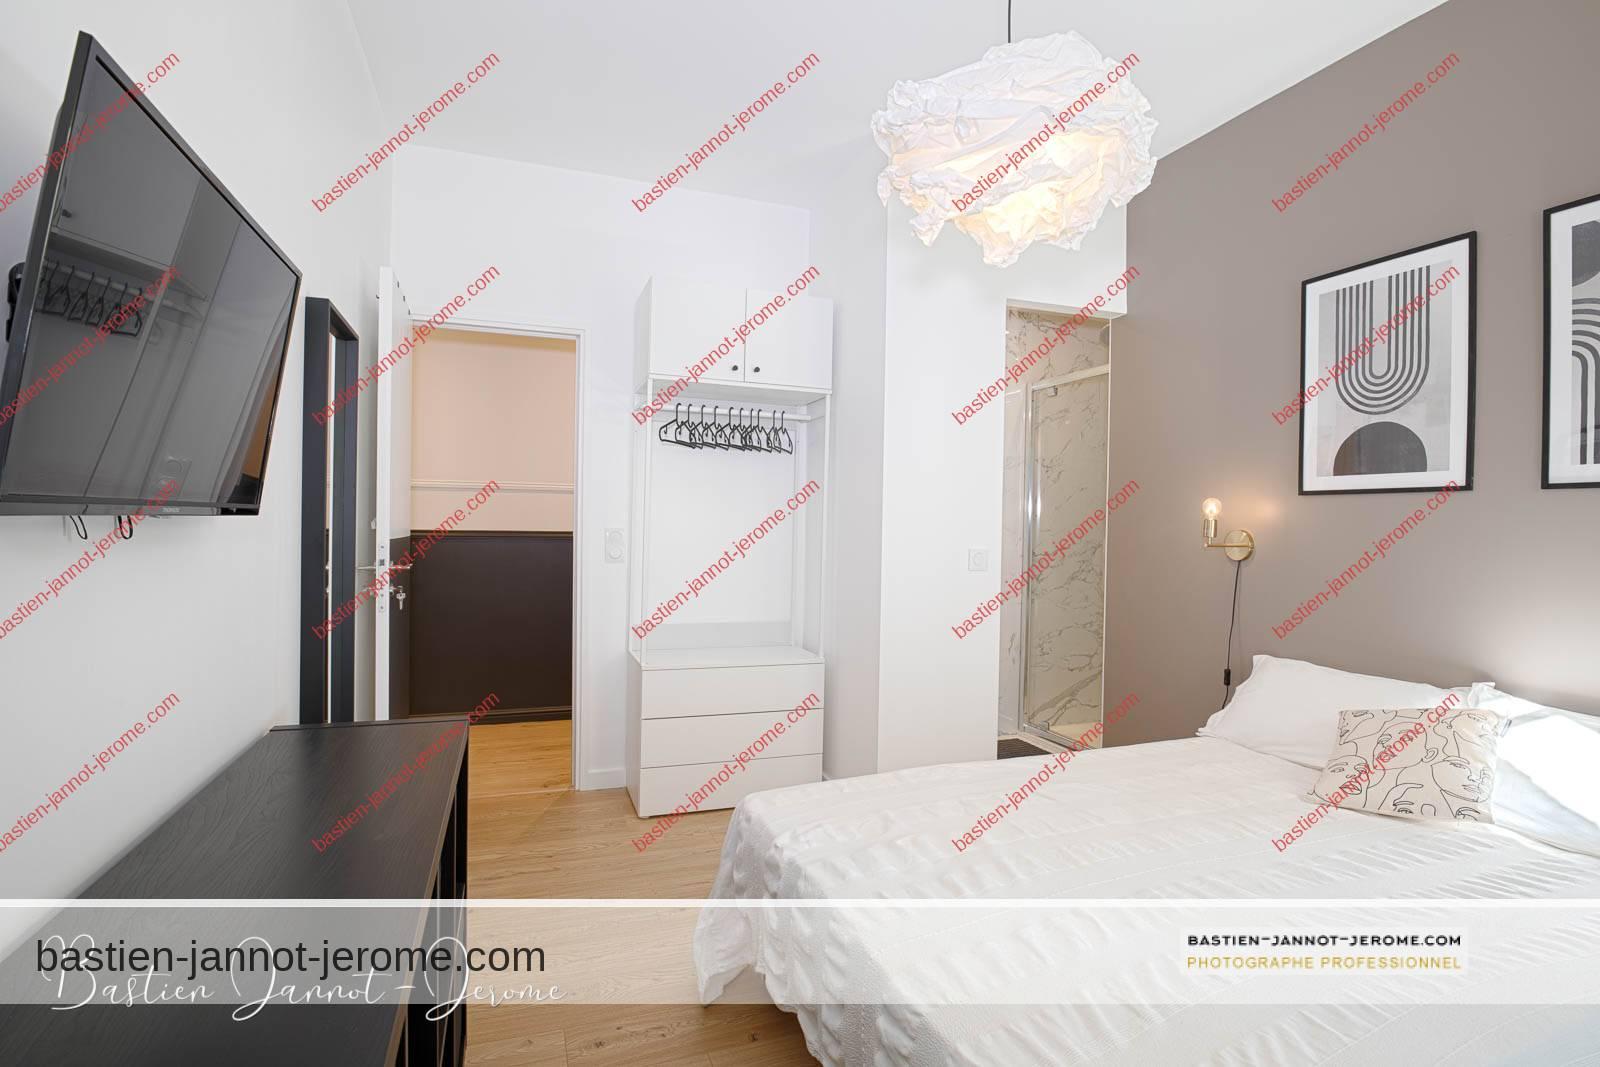 photographe immobilier sur Nice